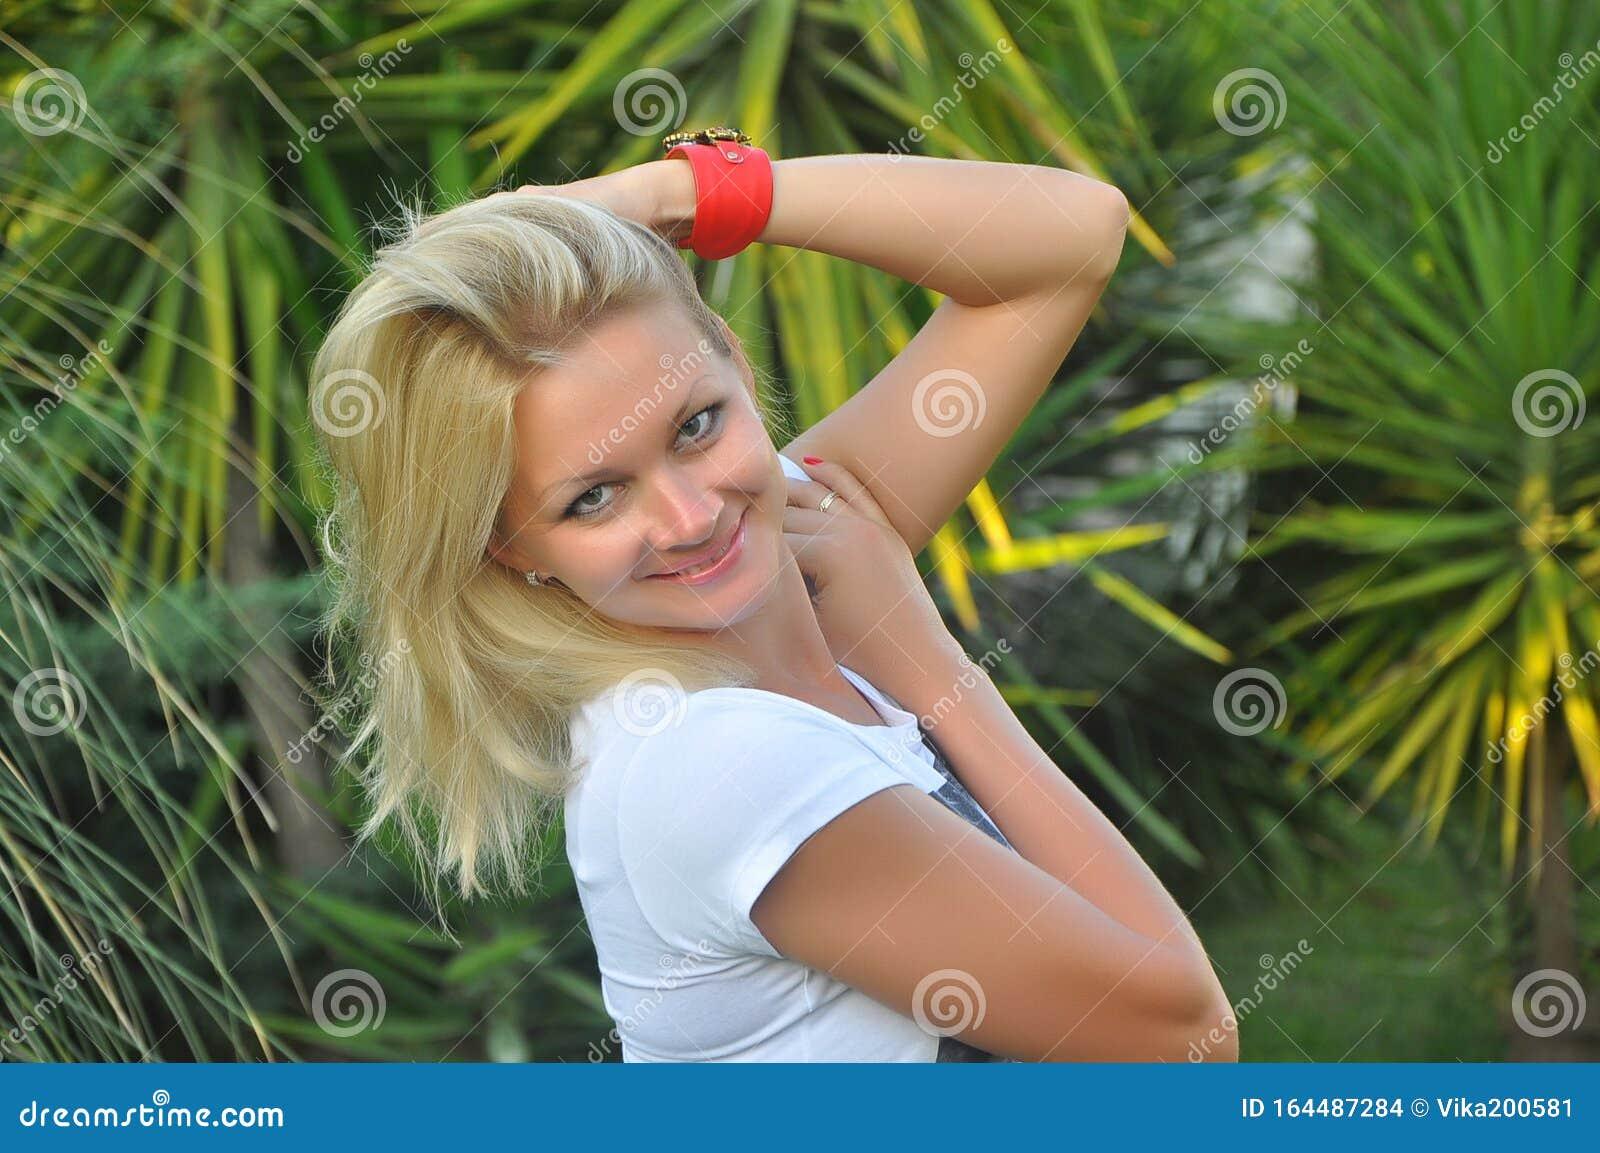 https://thumbs.dreamstime.com/z/portrait-beautiful-young-blonde-girl-classical-slavic-appearance-russian-beauty-slender-figure-beautiful-woman-164487284.jpg